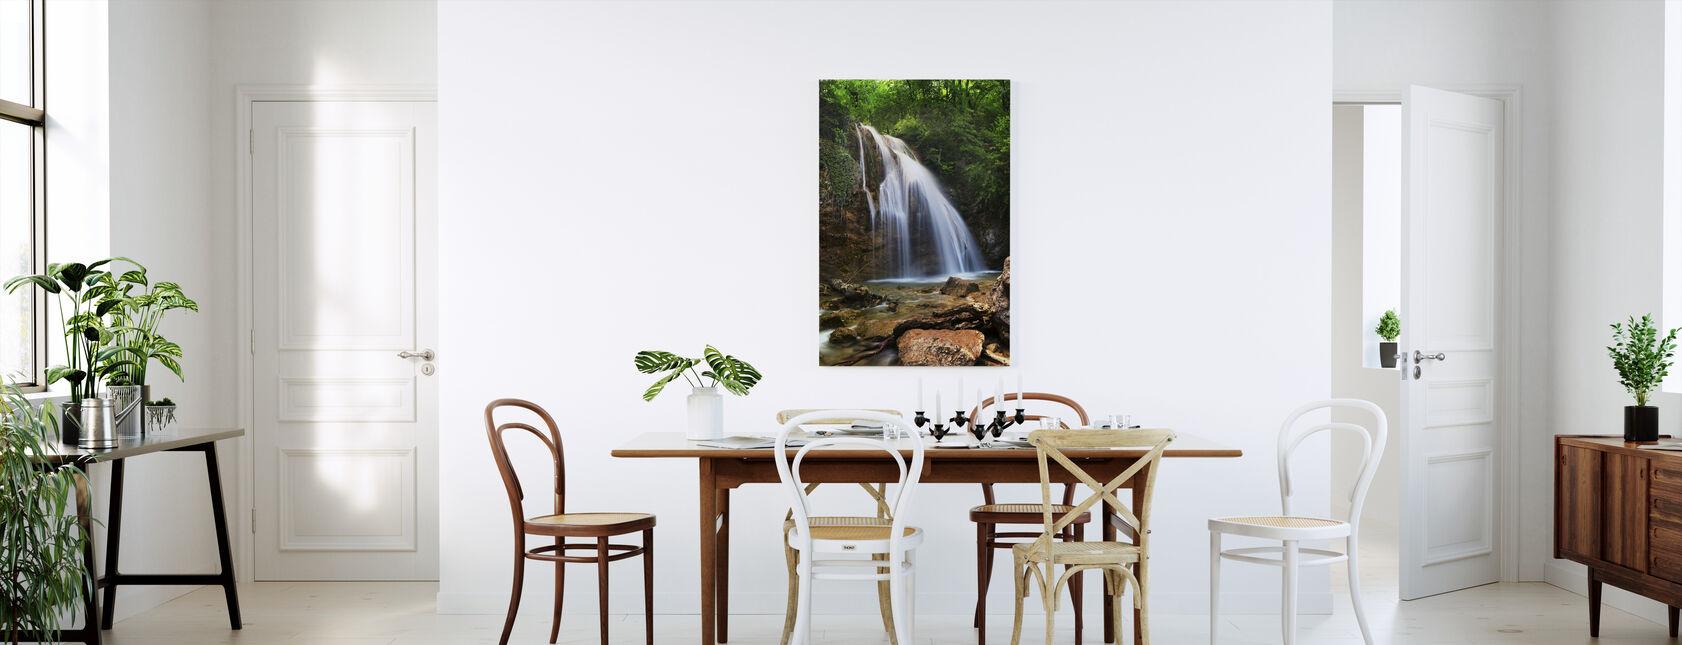 Lite vattenfall - Canvastavla - Kök